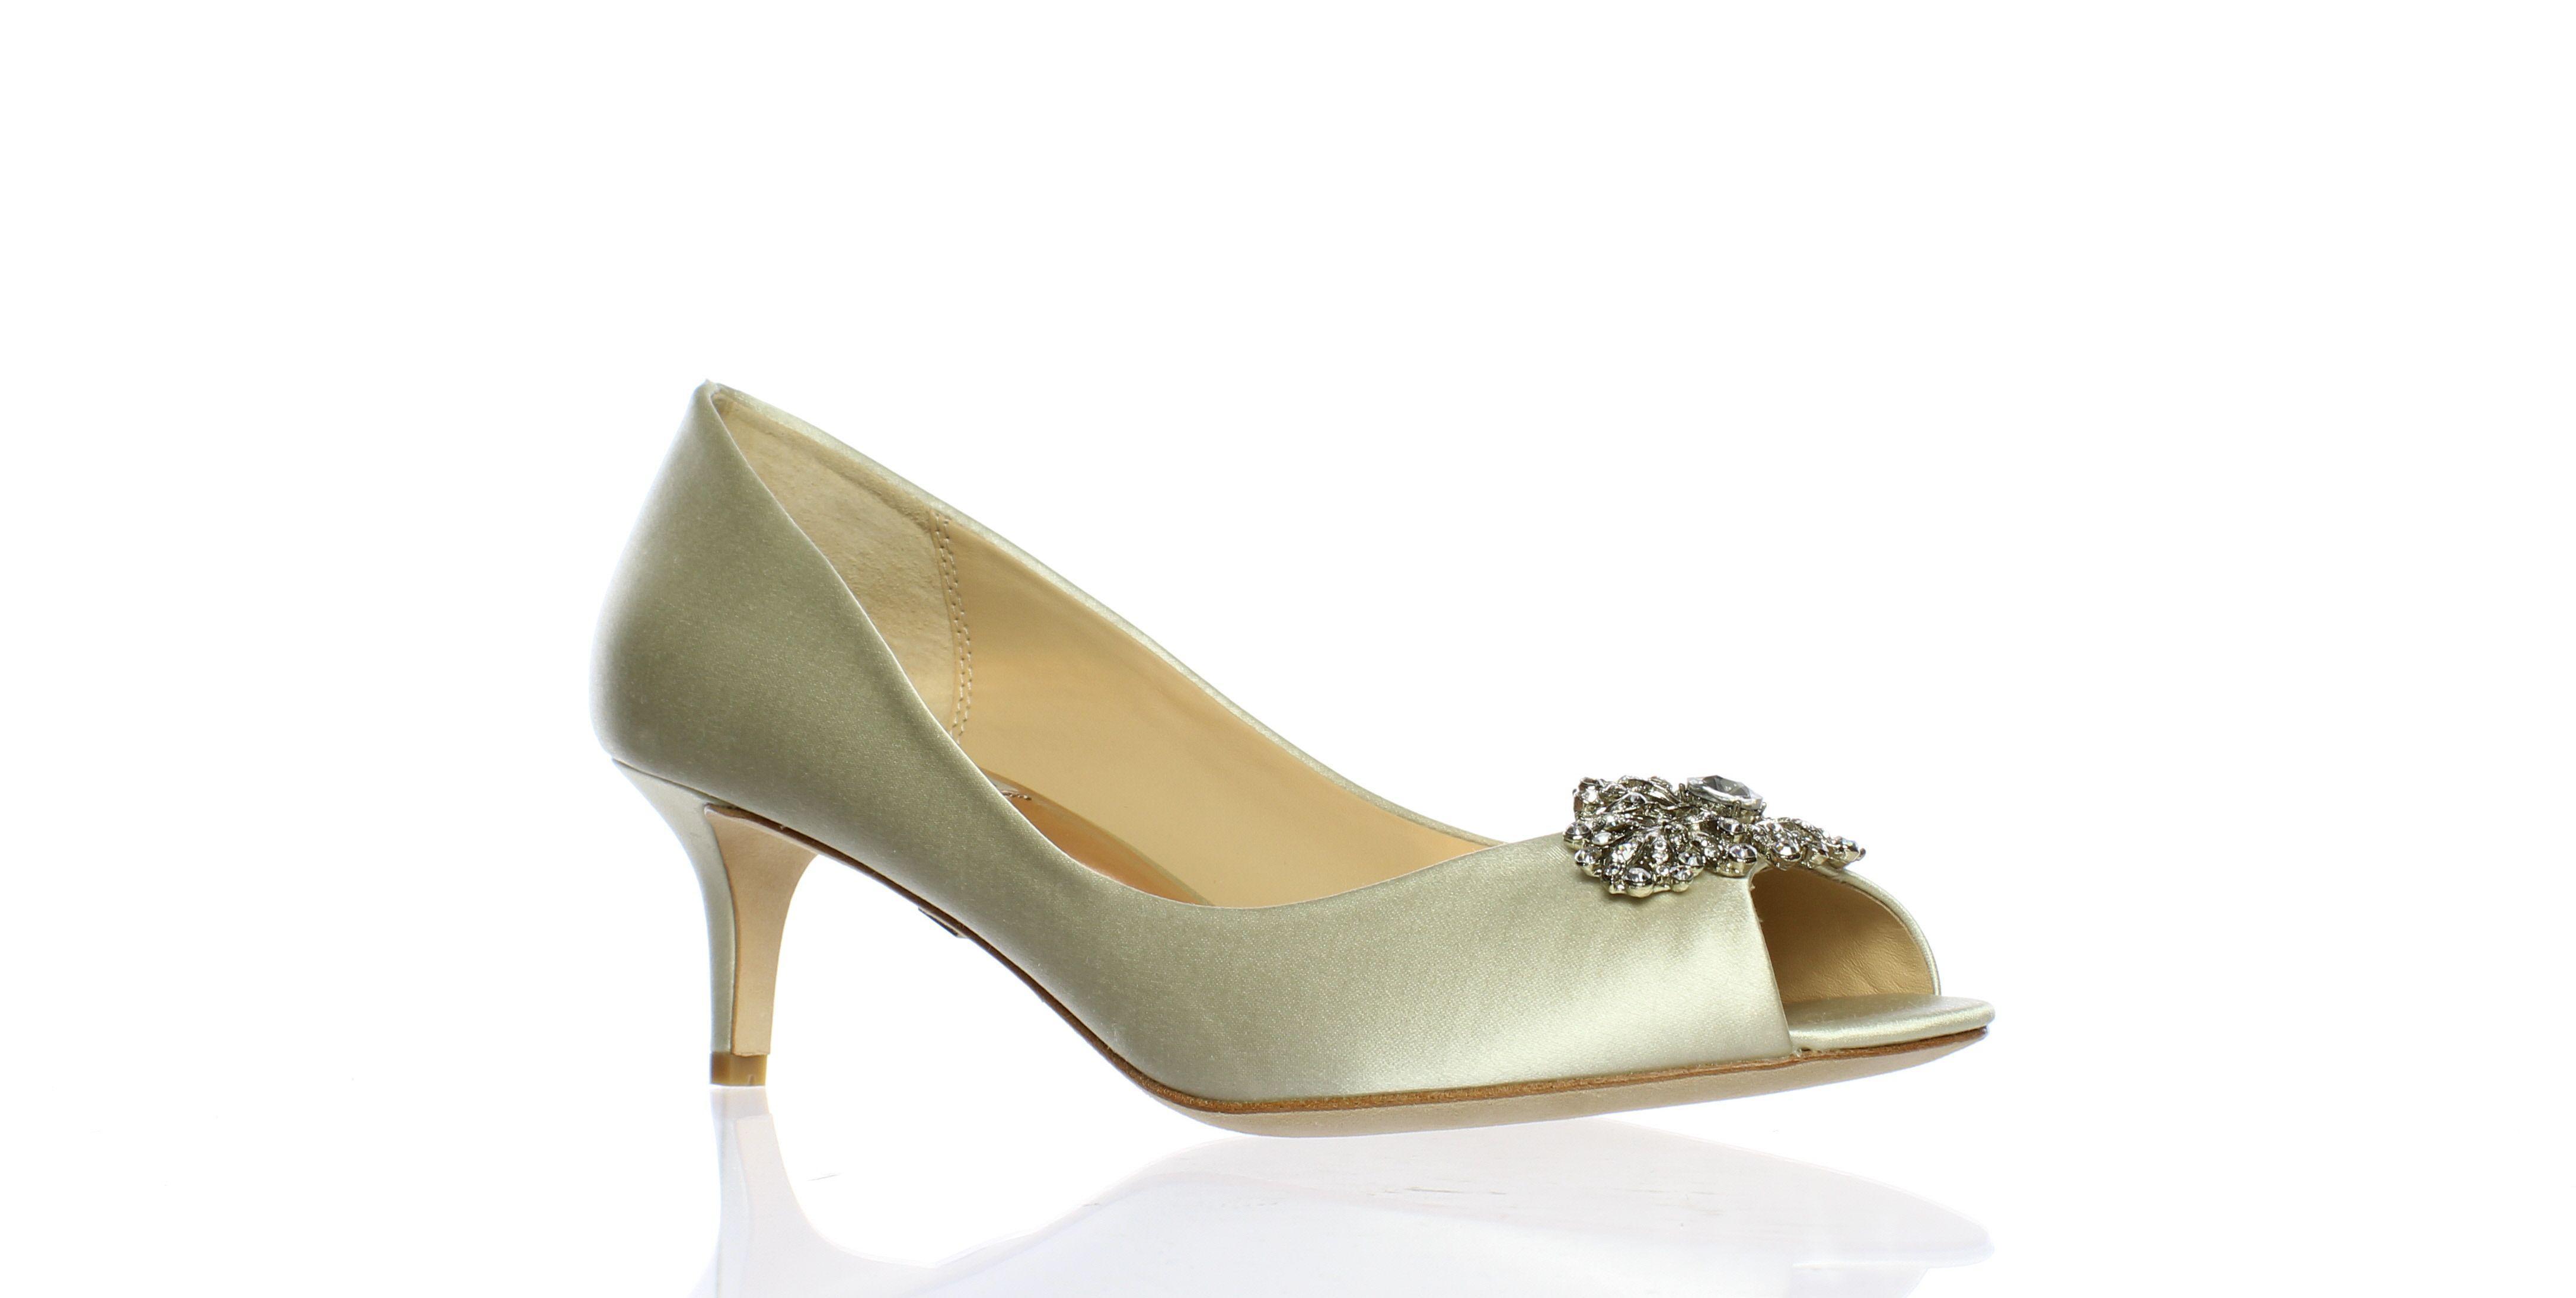 c7b1697f852 Lyst - Badgley Mischka Womens Layla Ivory Peep Toe Heels in White